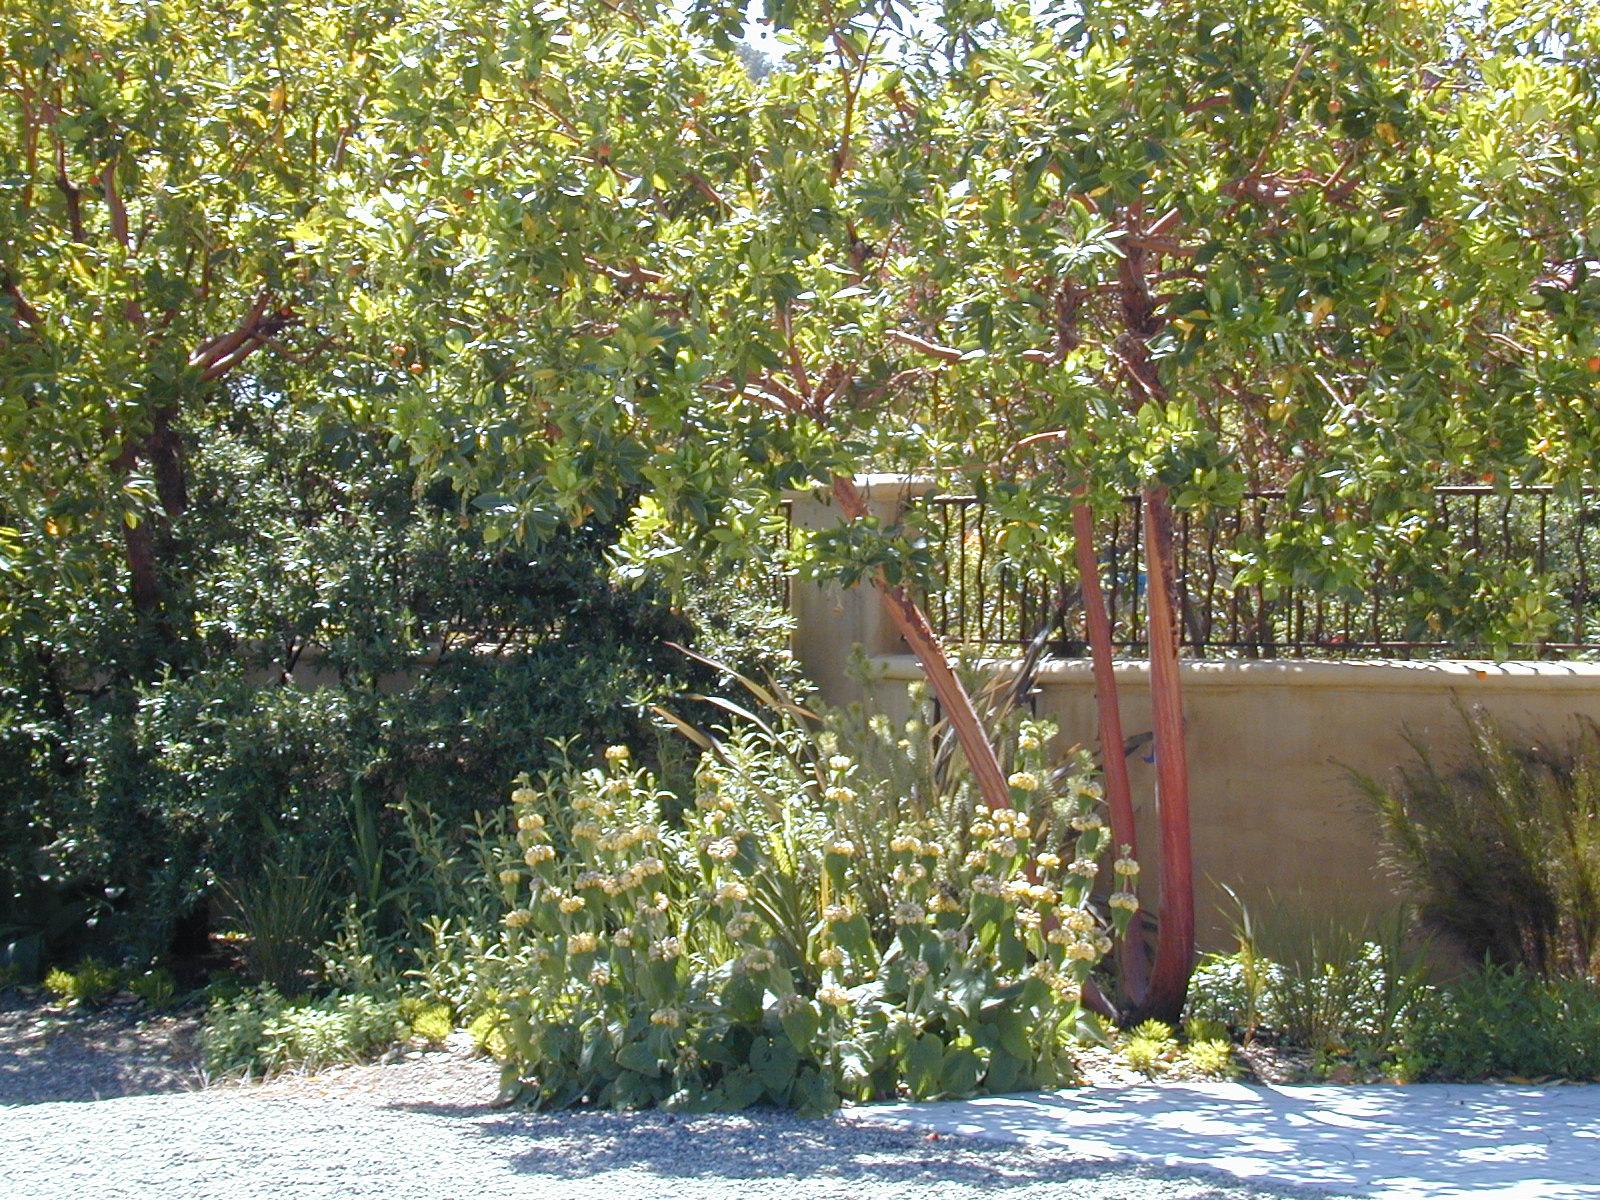 arbutus marina strawberry tree - photo #27